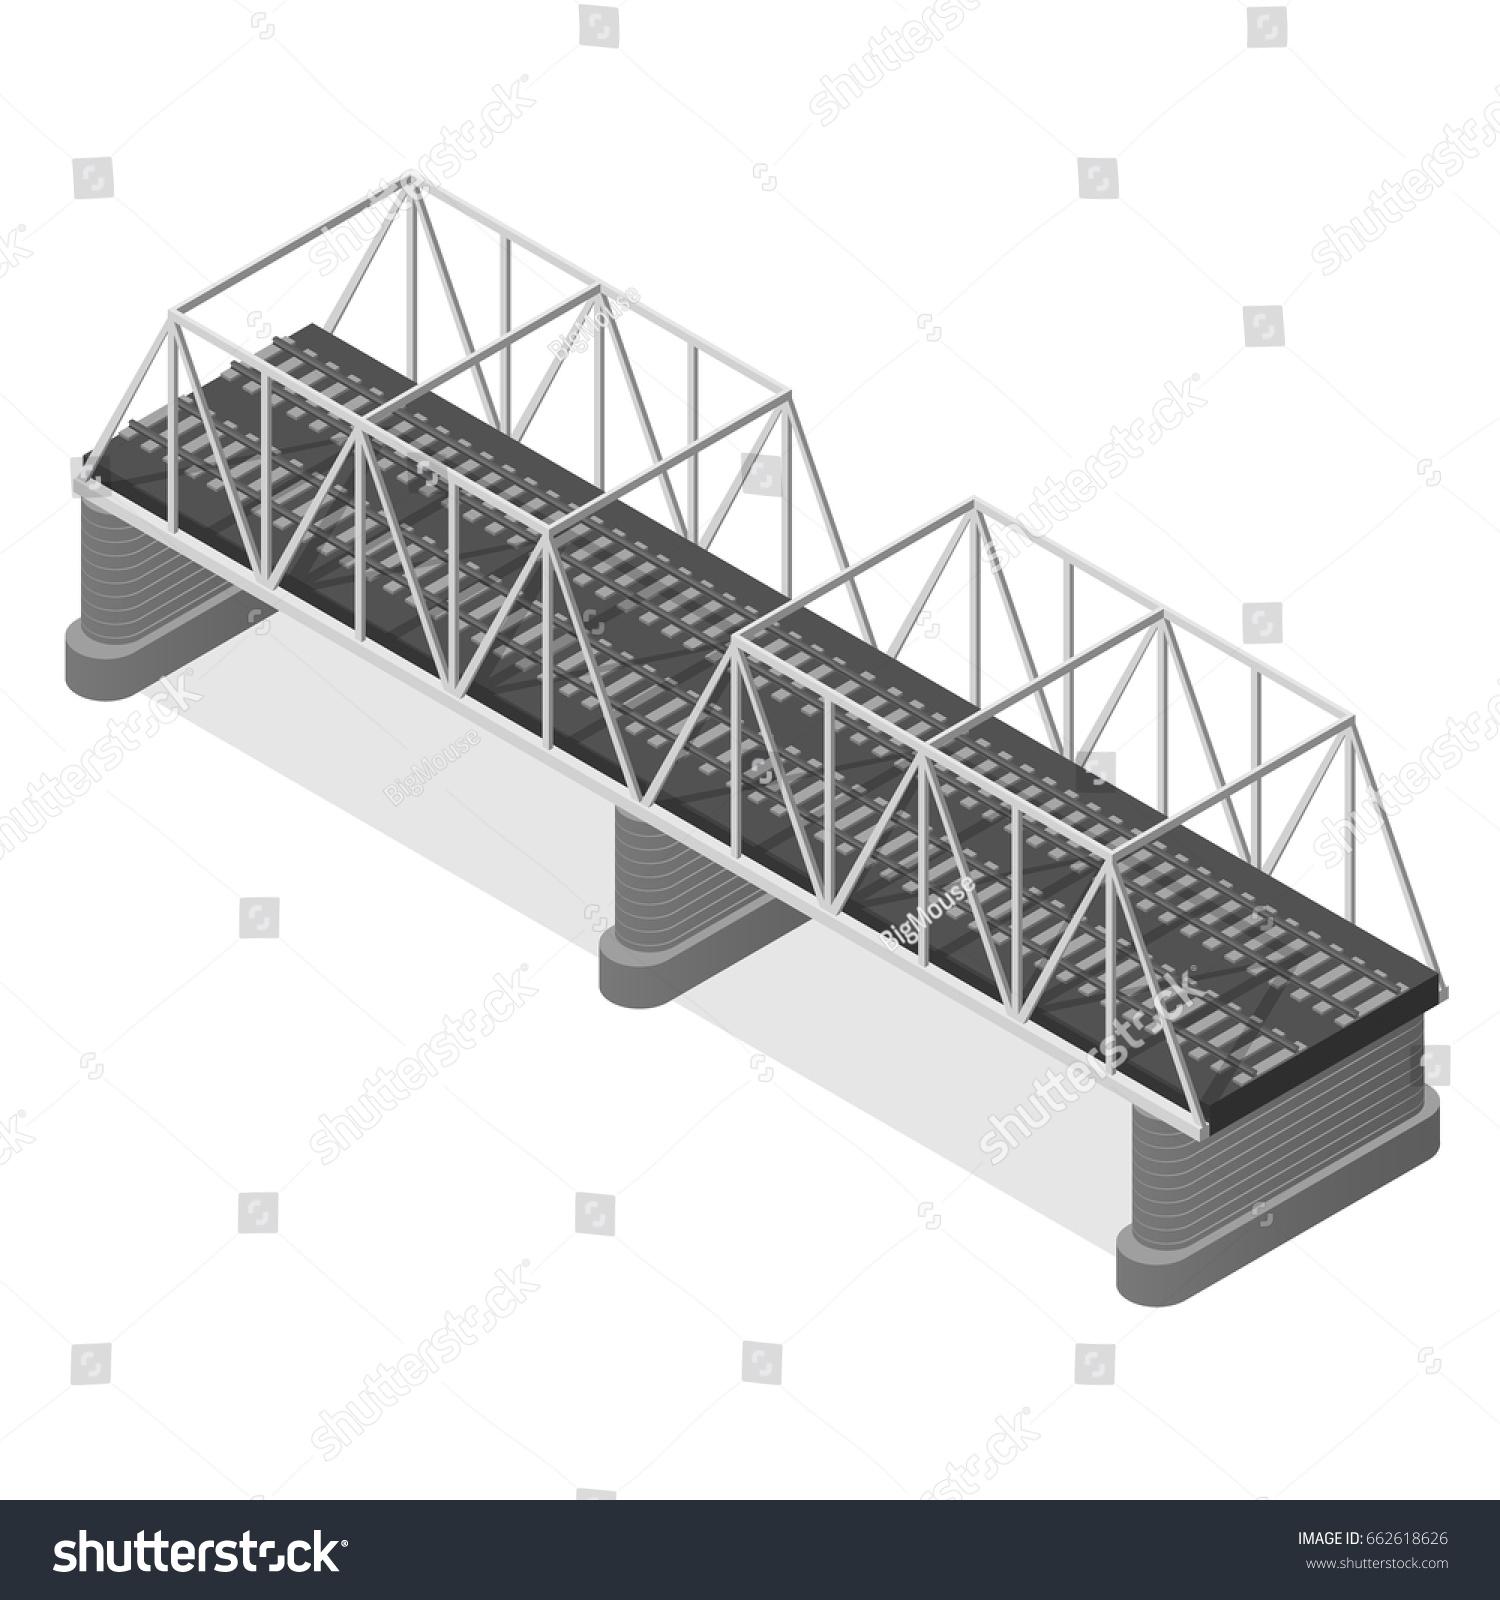 Steel Railway Bridge Isometric View Construction Stock Illustration Truss Diagram Beam Basic Use For Web And Mobile